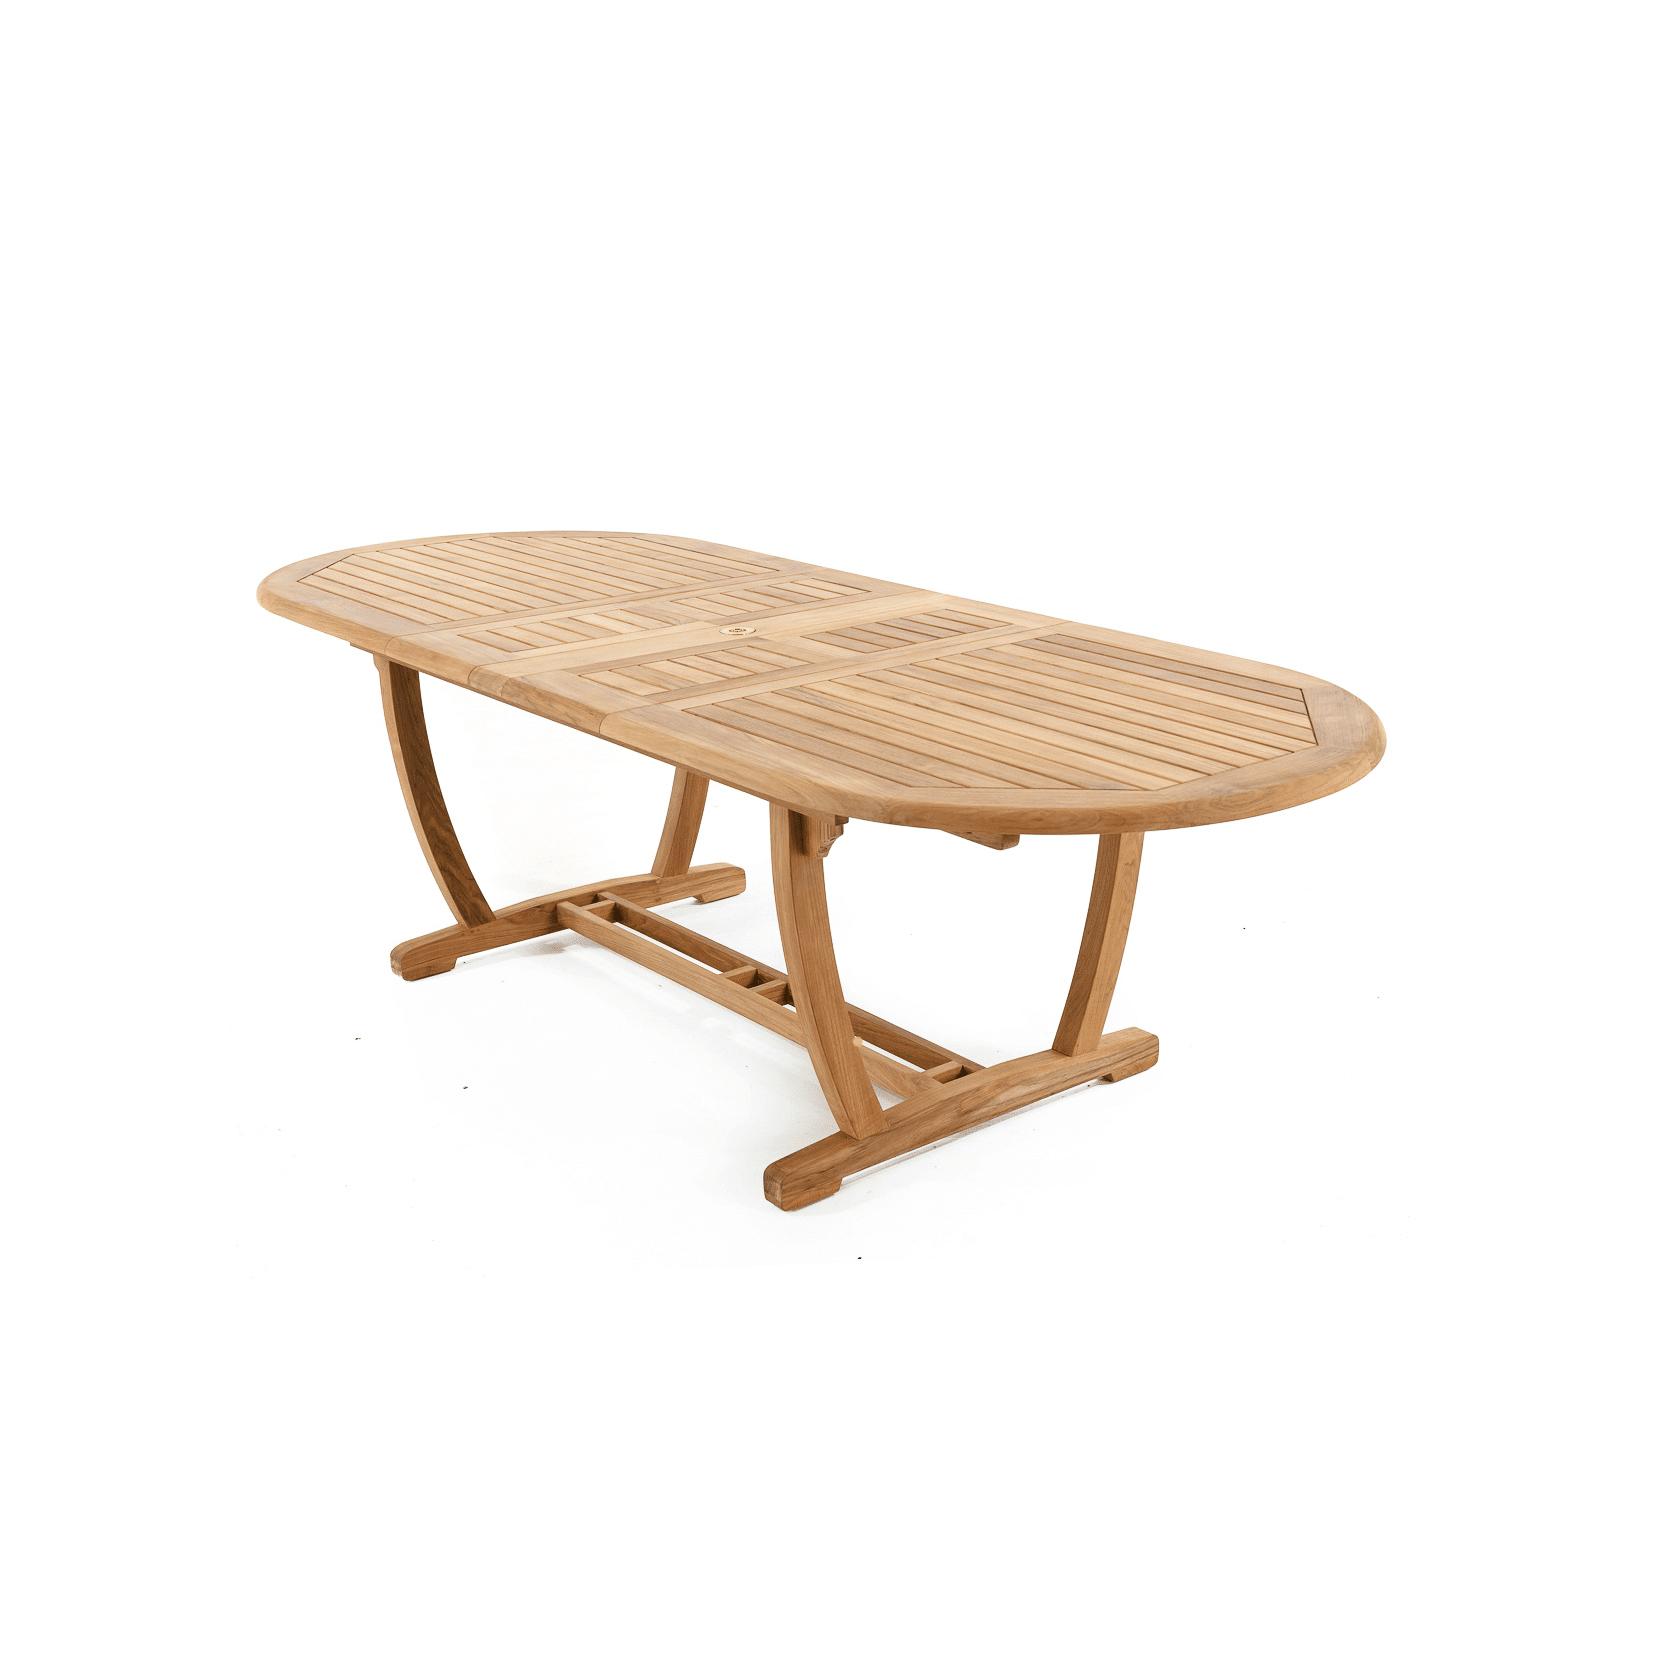 Teak Extendable Coffee Table: Teak Extendable Long Oval Table - GDT15